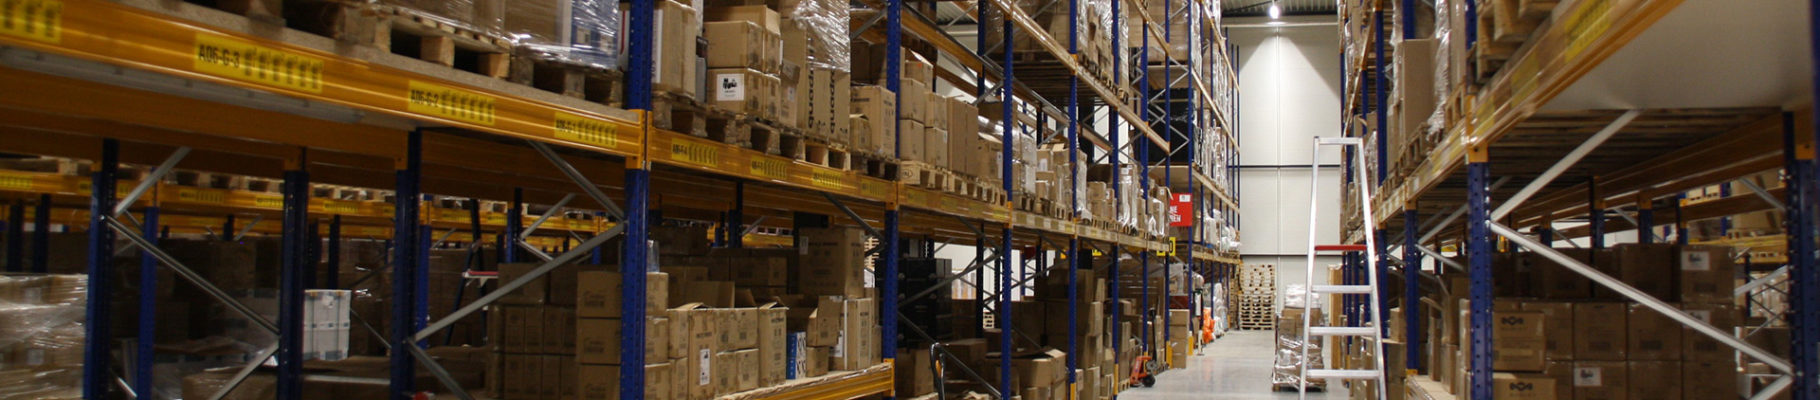 warehousing distribution opslag distributie cyberfreight nieuw vennep schiphol